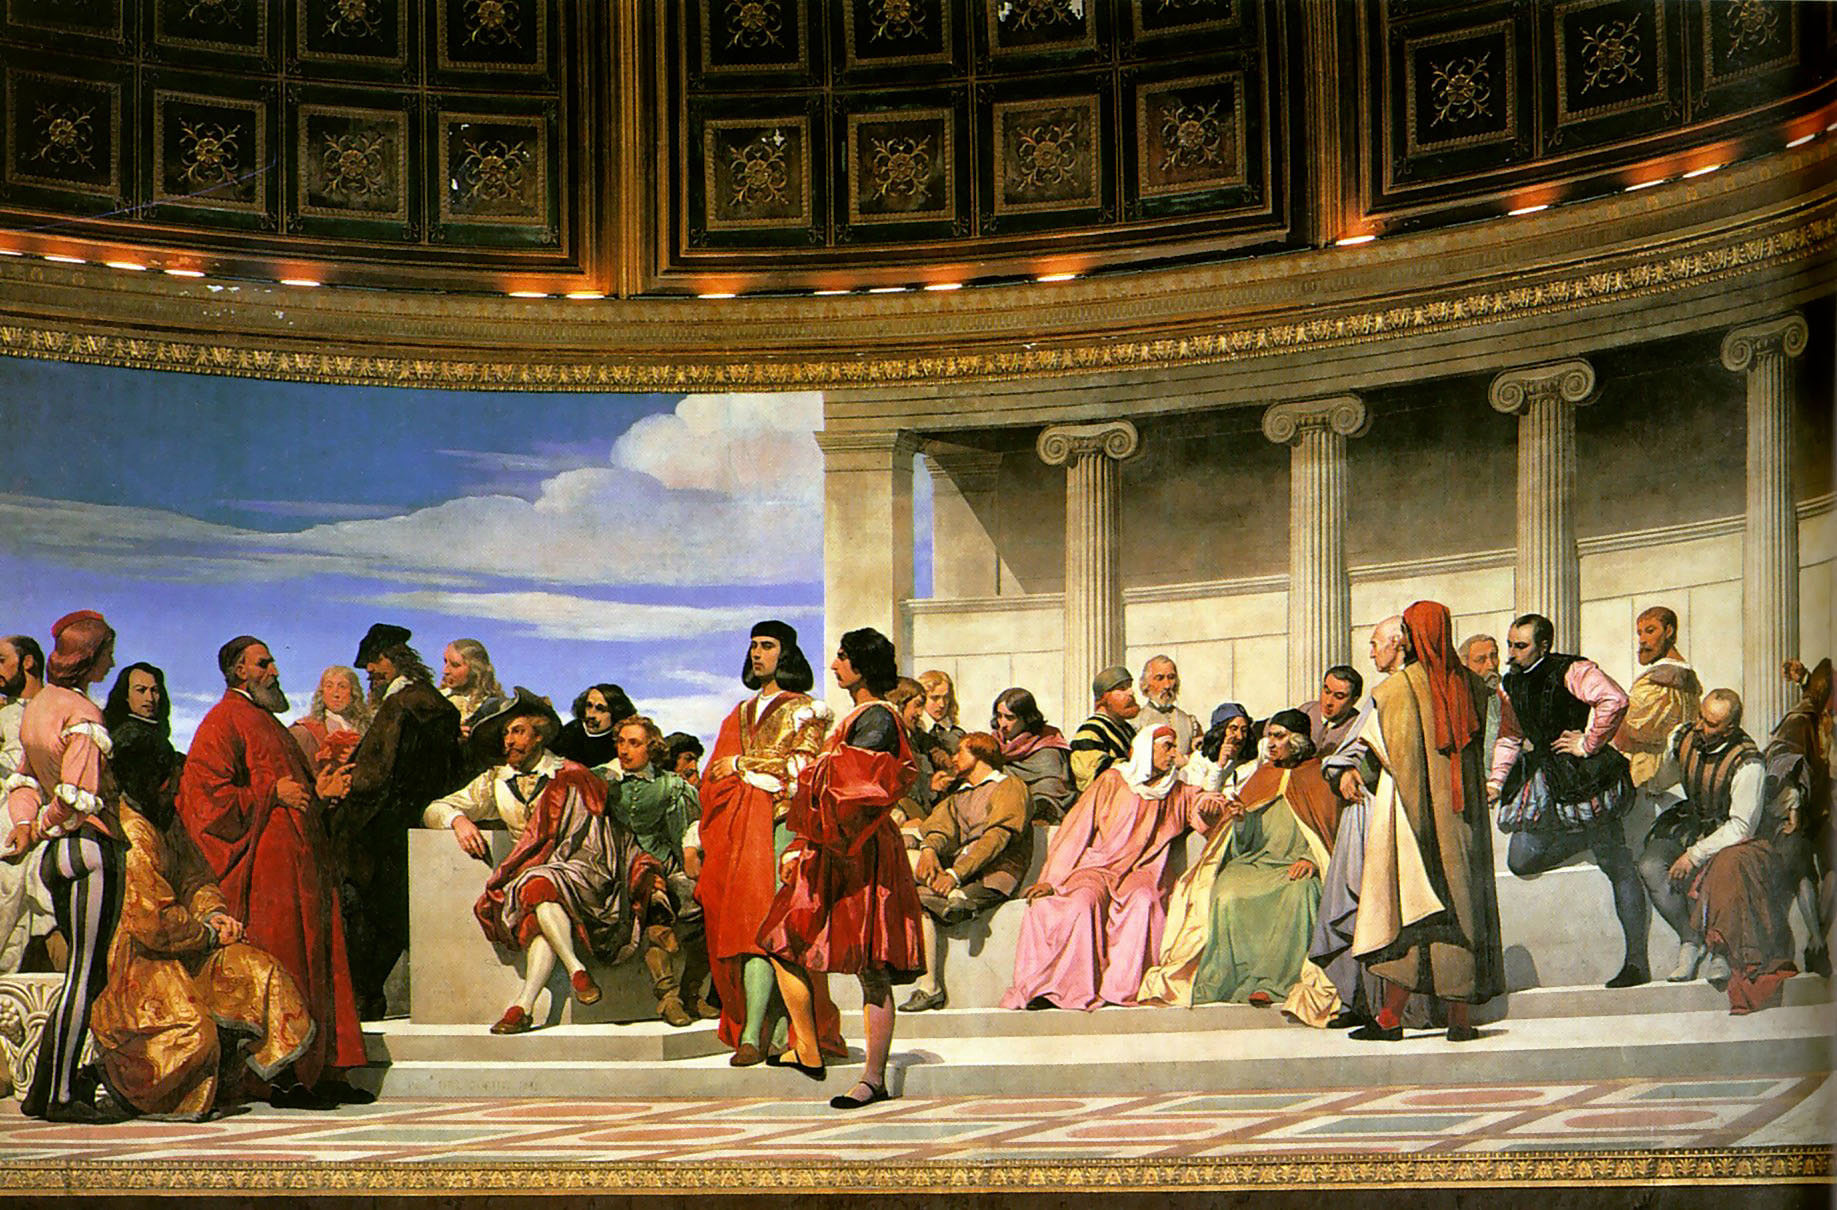 Semicircle at the School of Fine Arts :: Paul Delaroche - Antique world scenes ôîòî